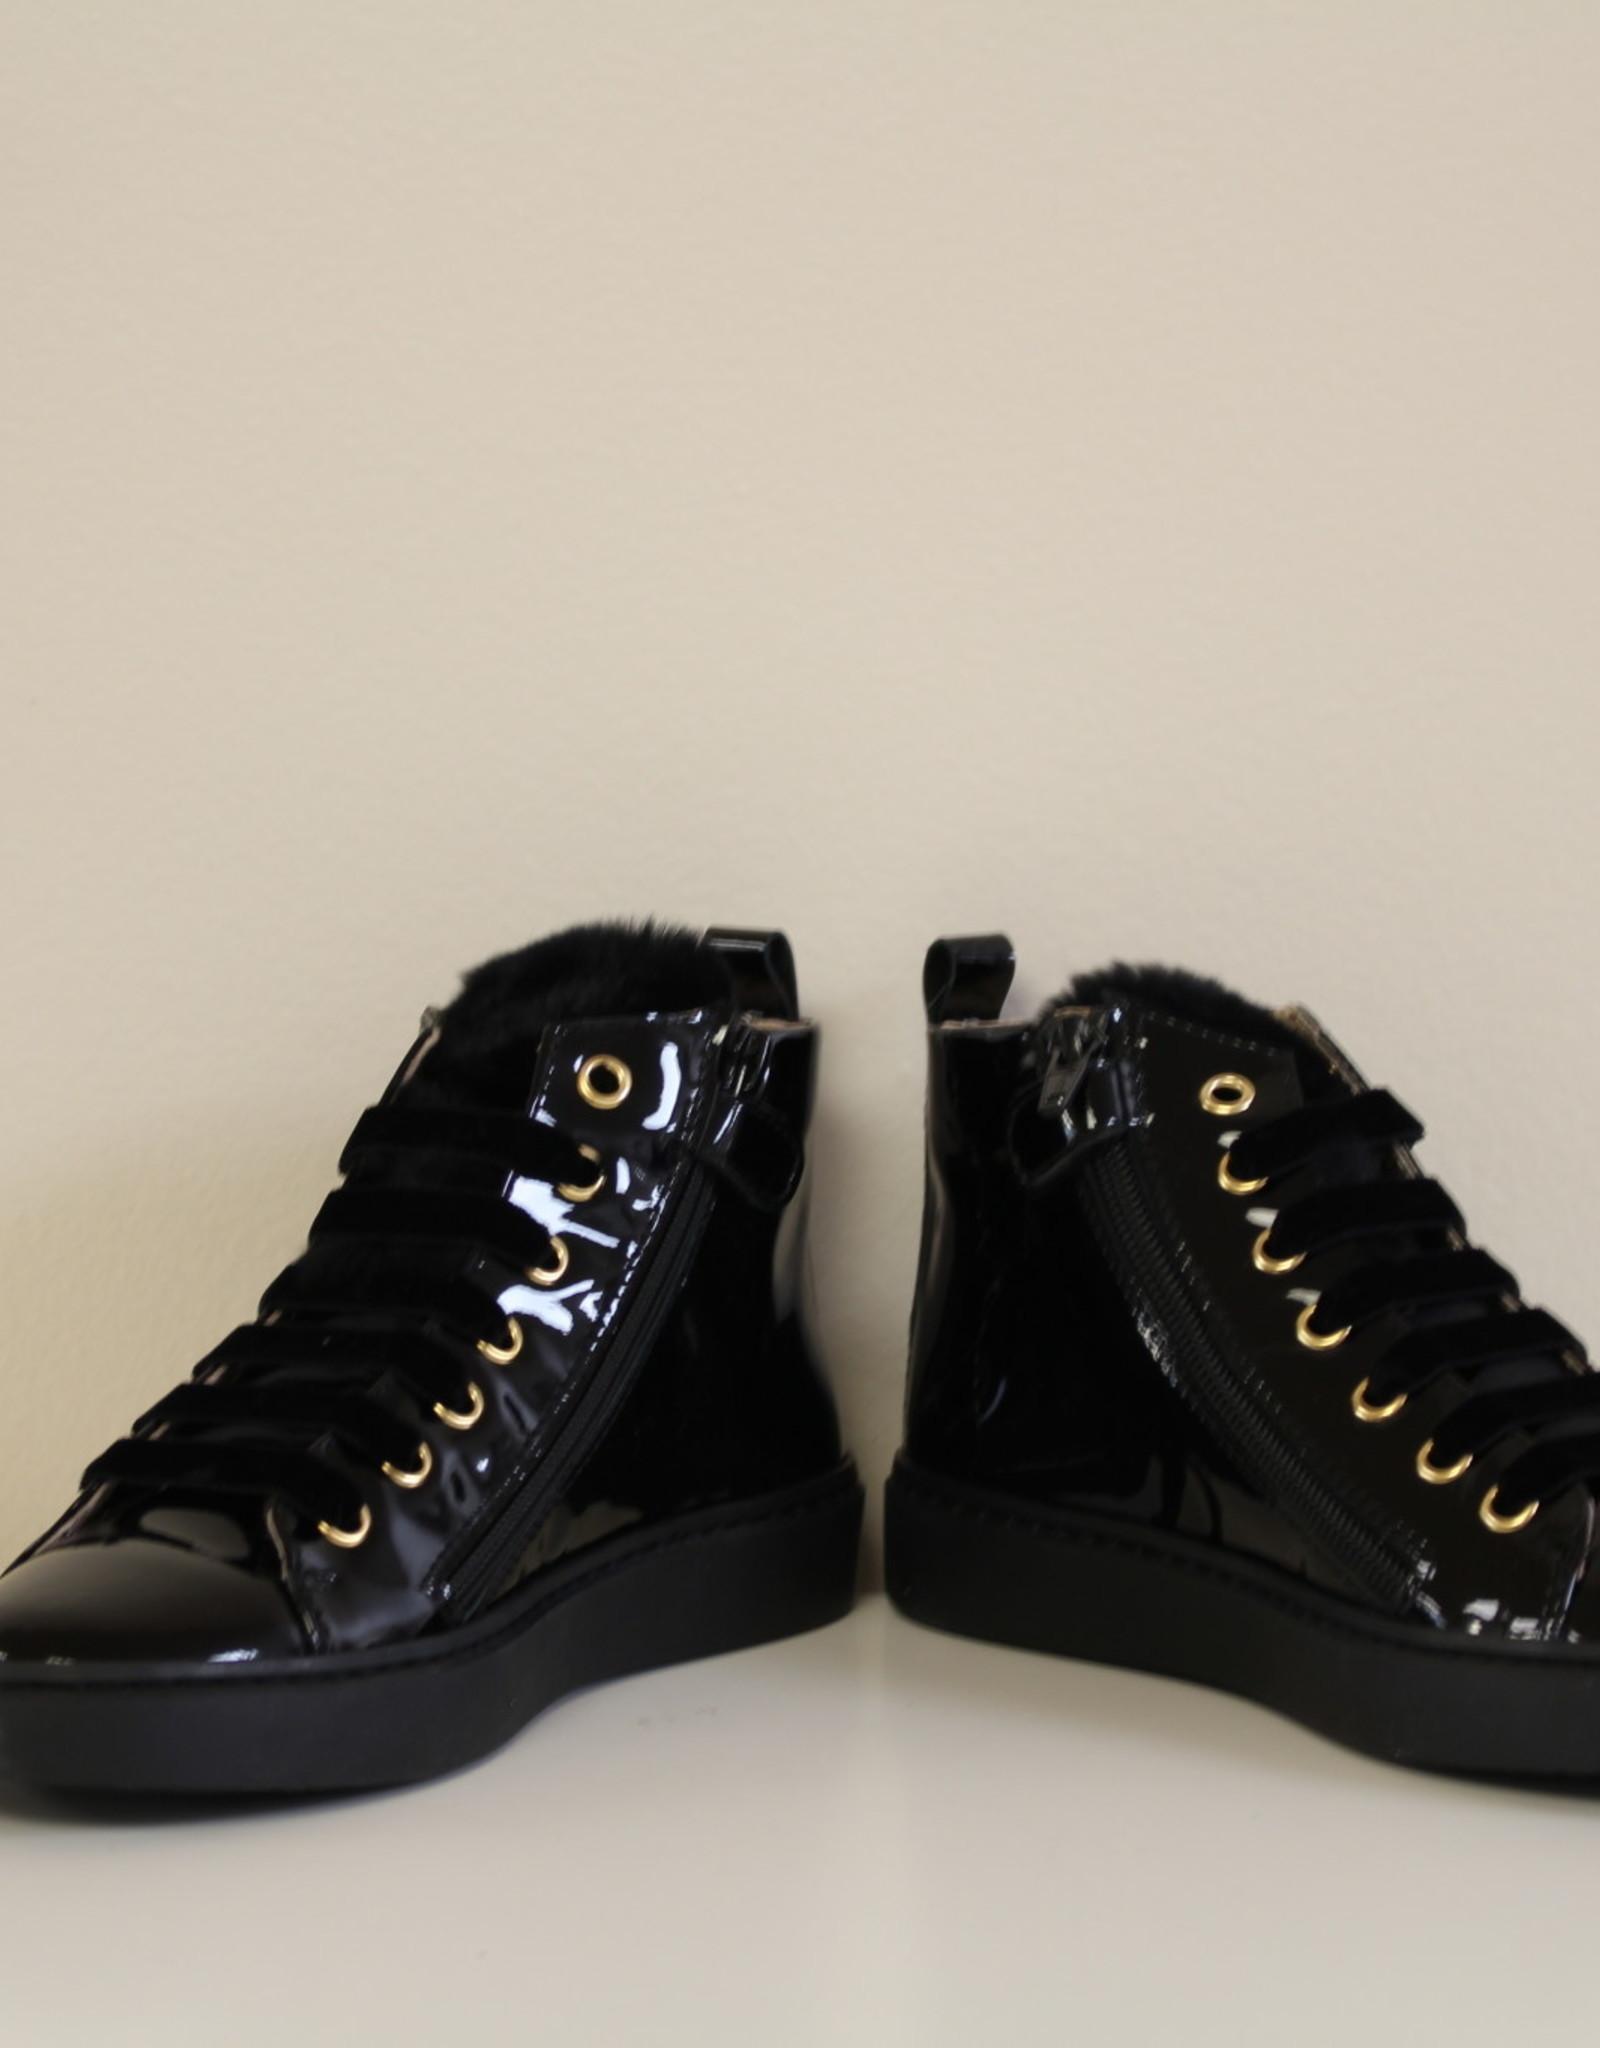 Banaline 22870 vernice zwart